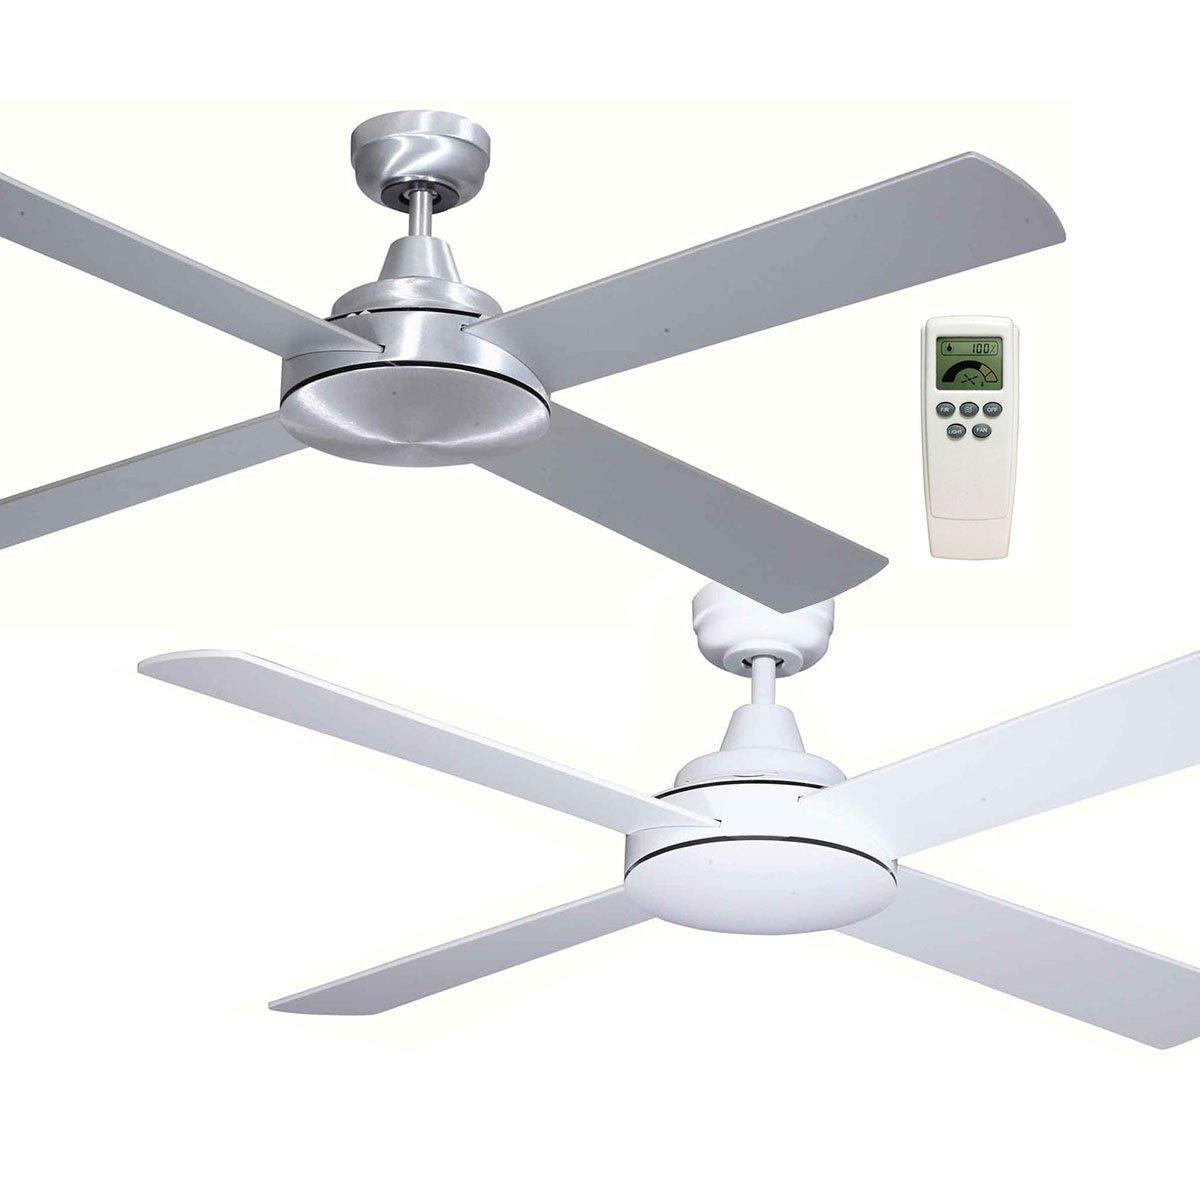 Large Ceiling Fans For High Ceilings Australia: Grange 1300 DC Ceiling Fan With Light